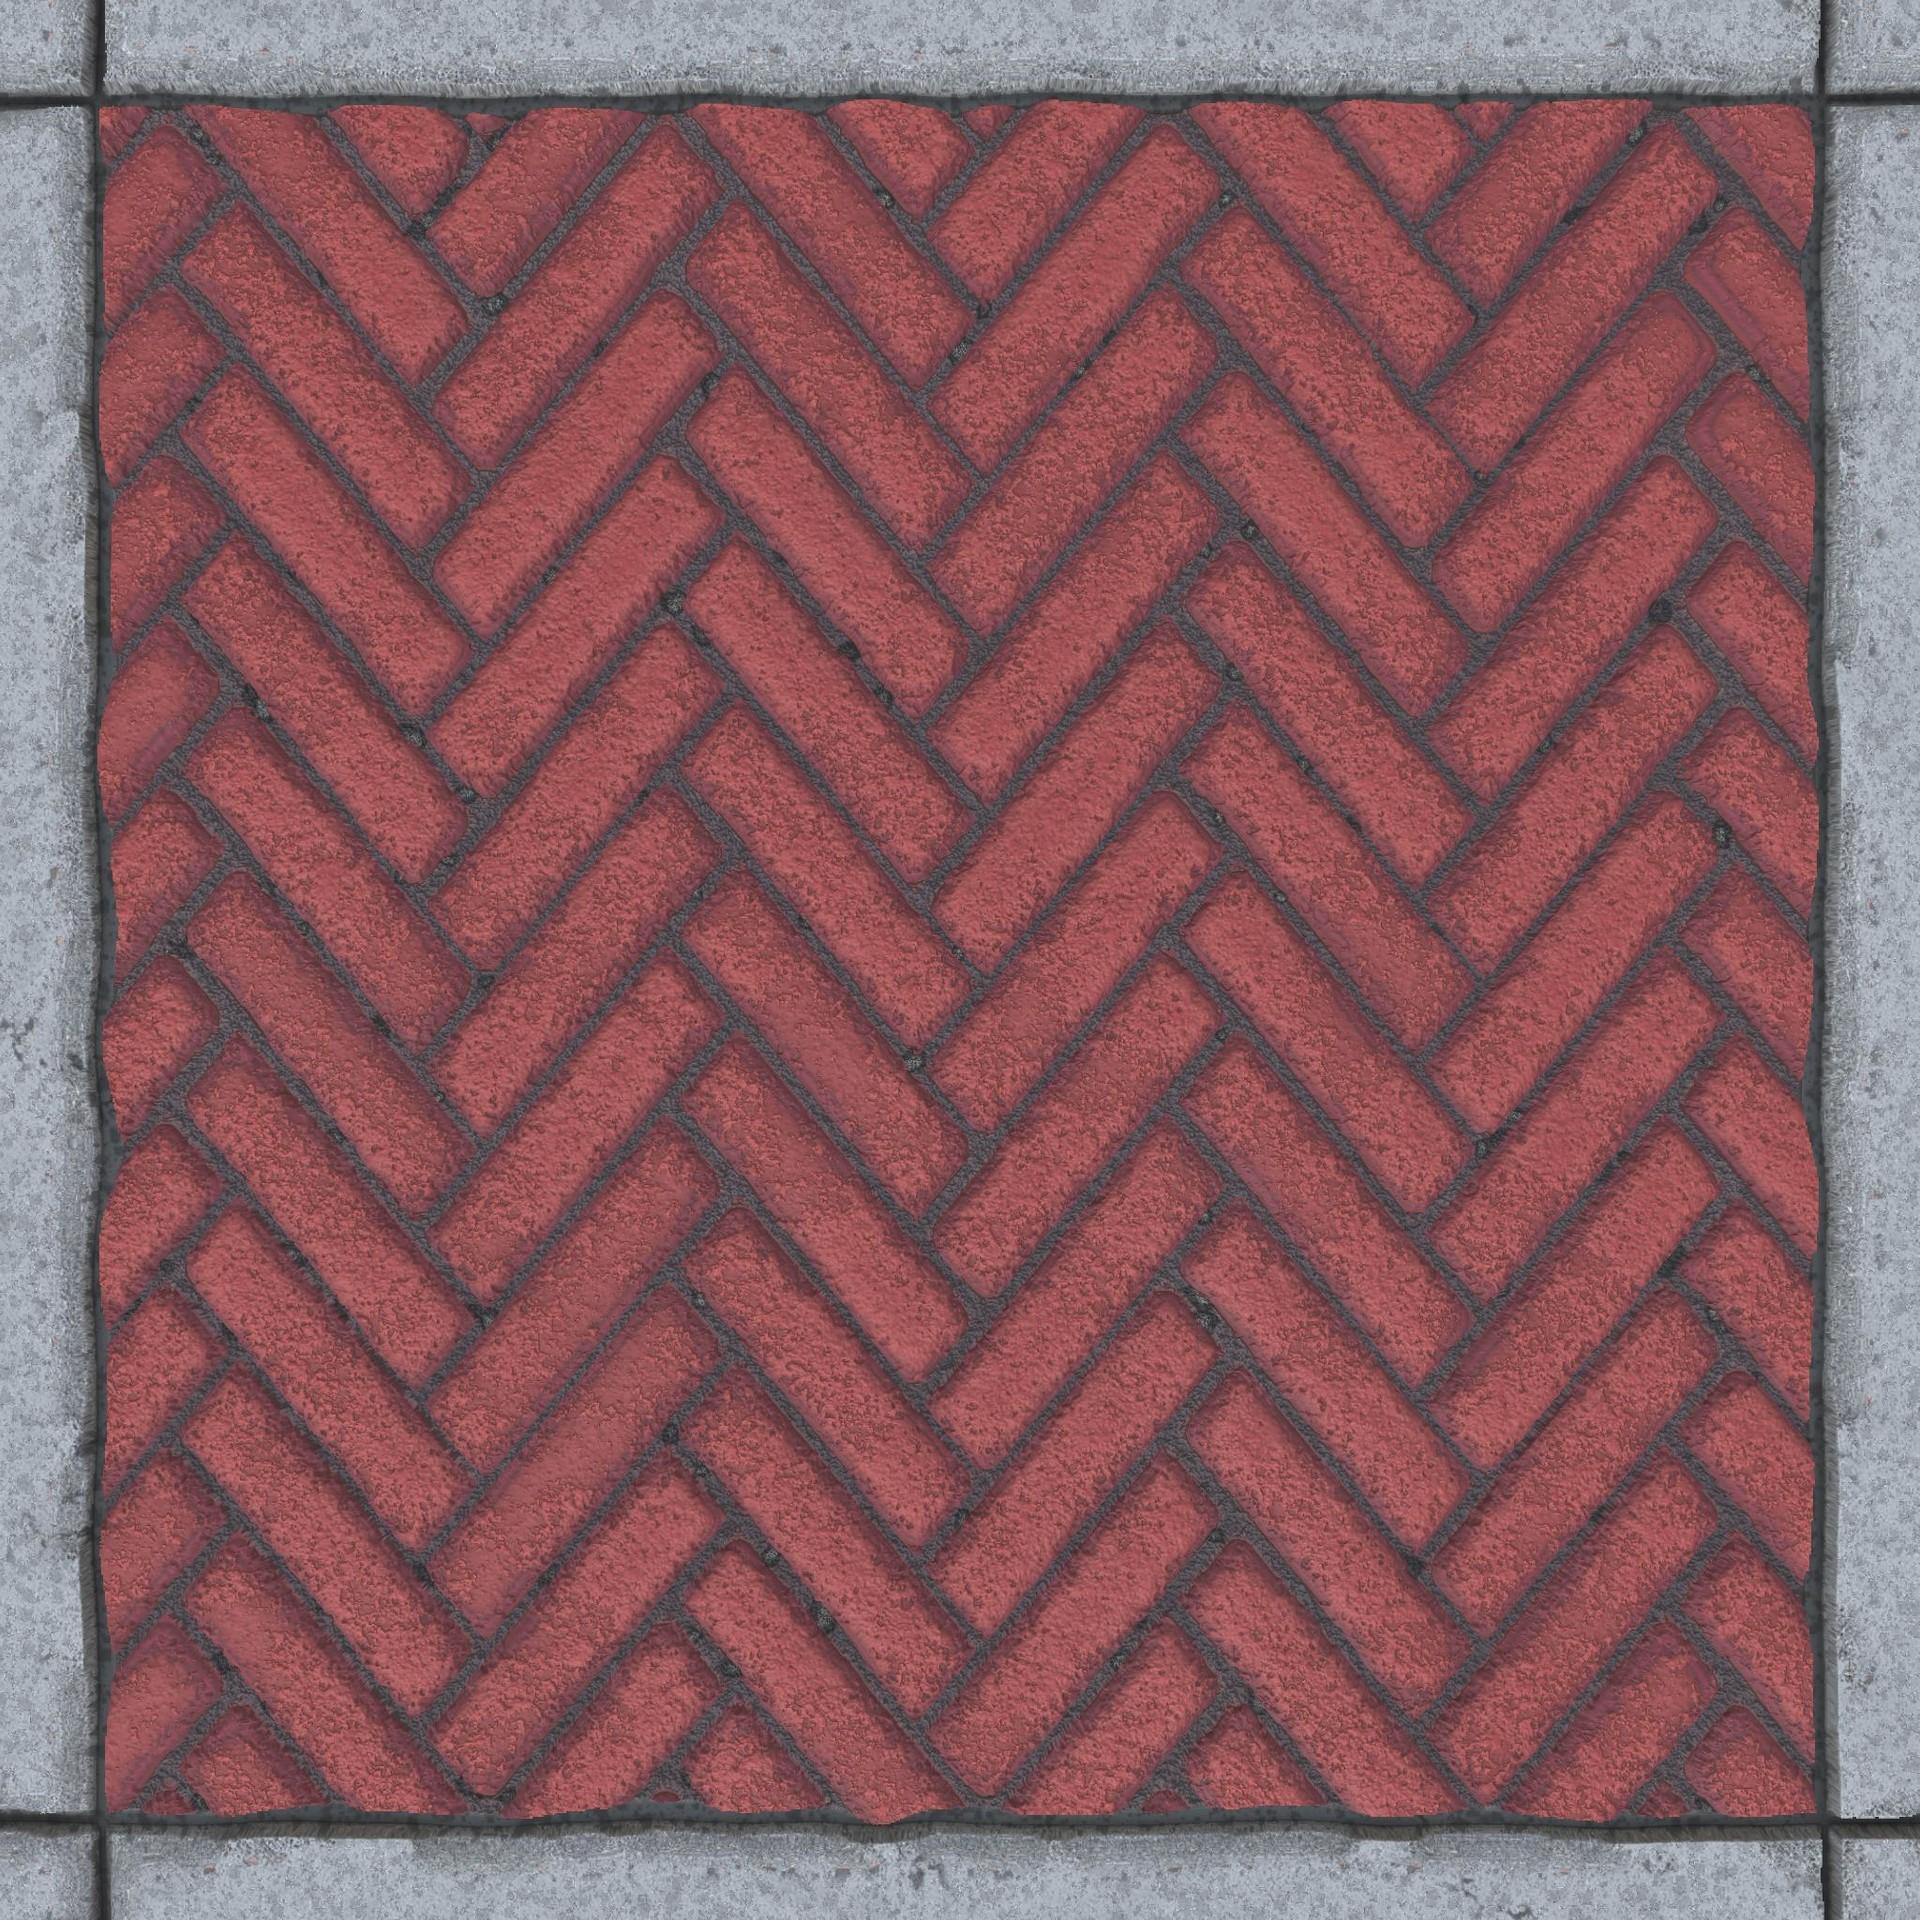 James ray sidewalk 3